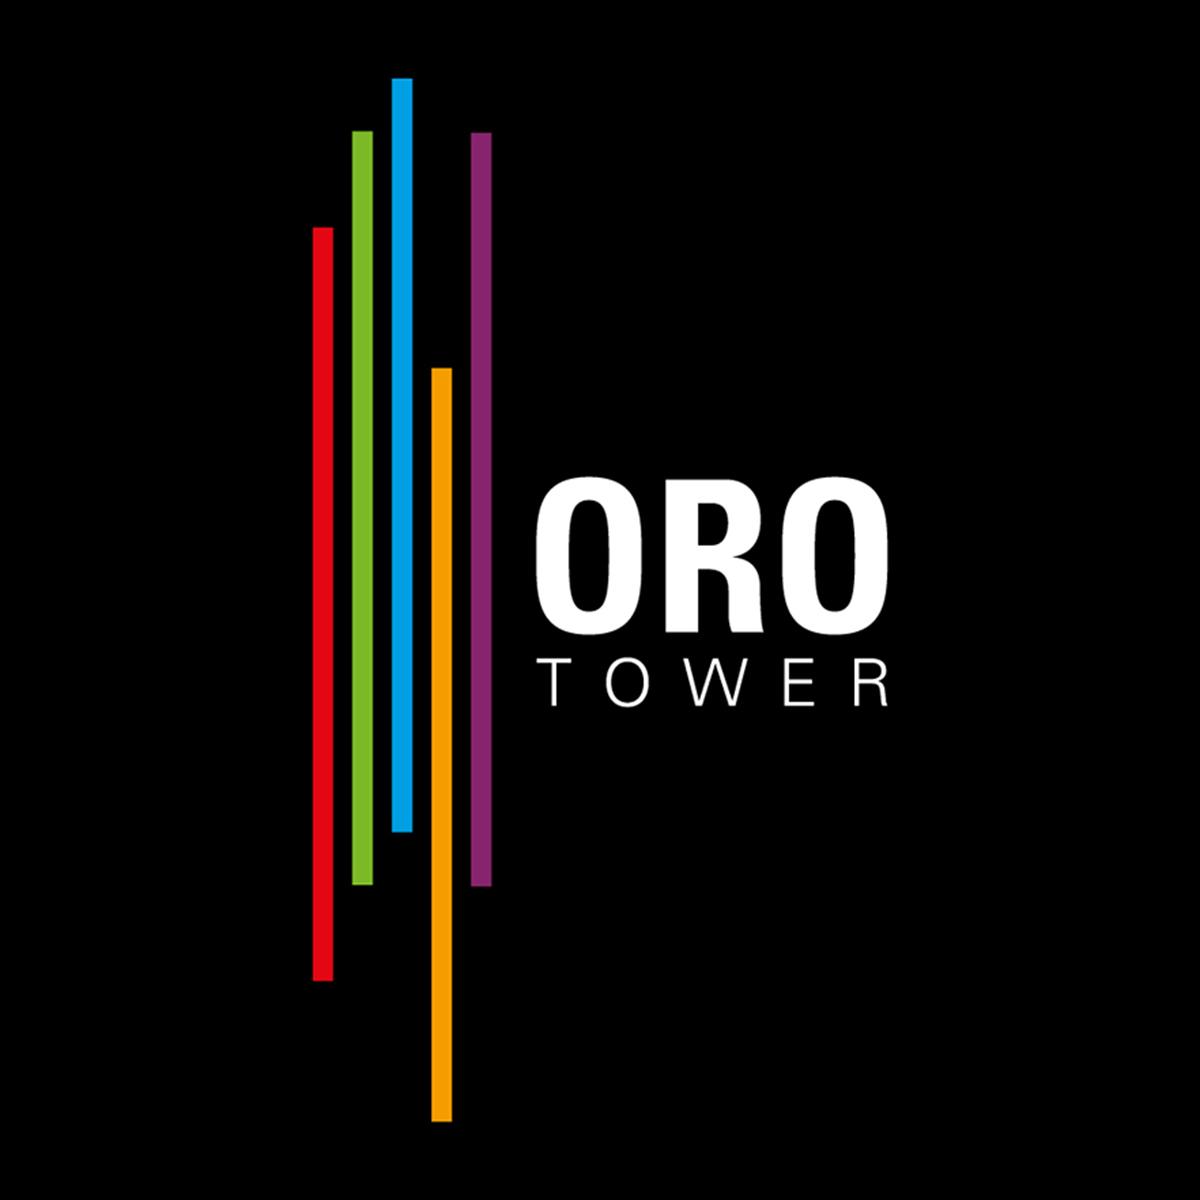 Oro Tower / Argentina / Naming / Marca